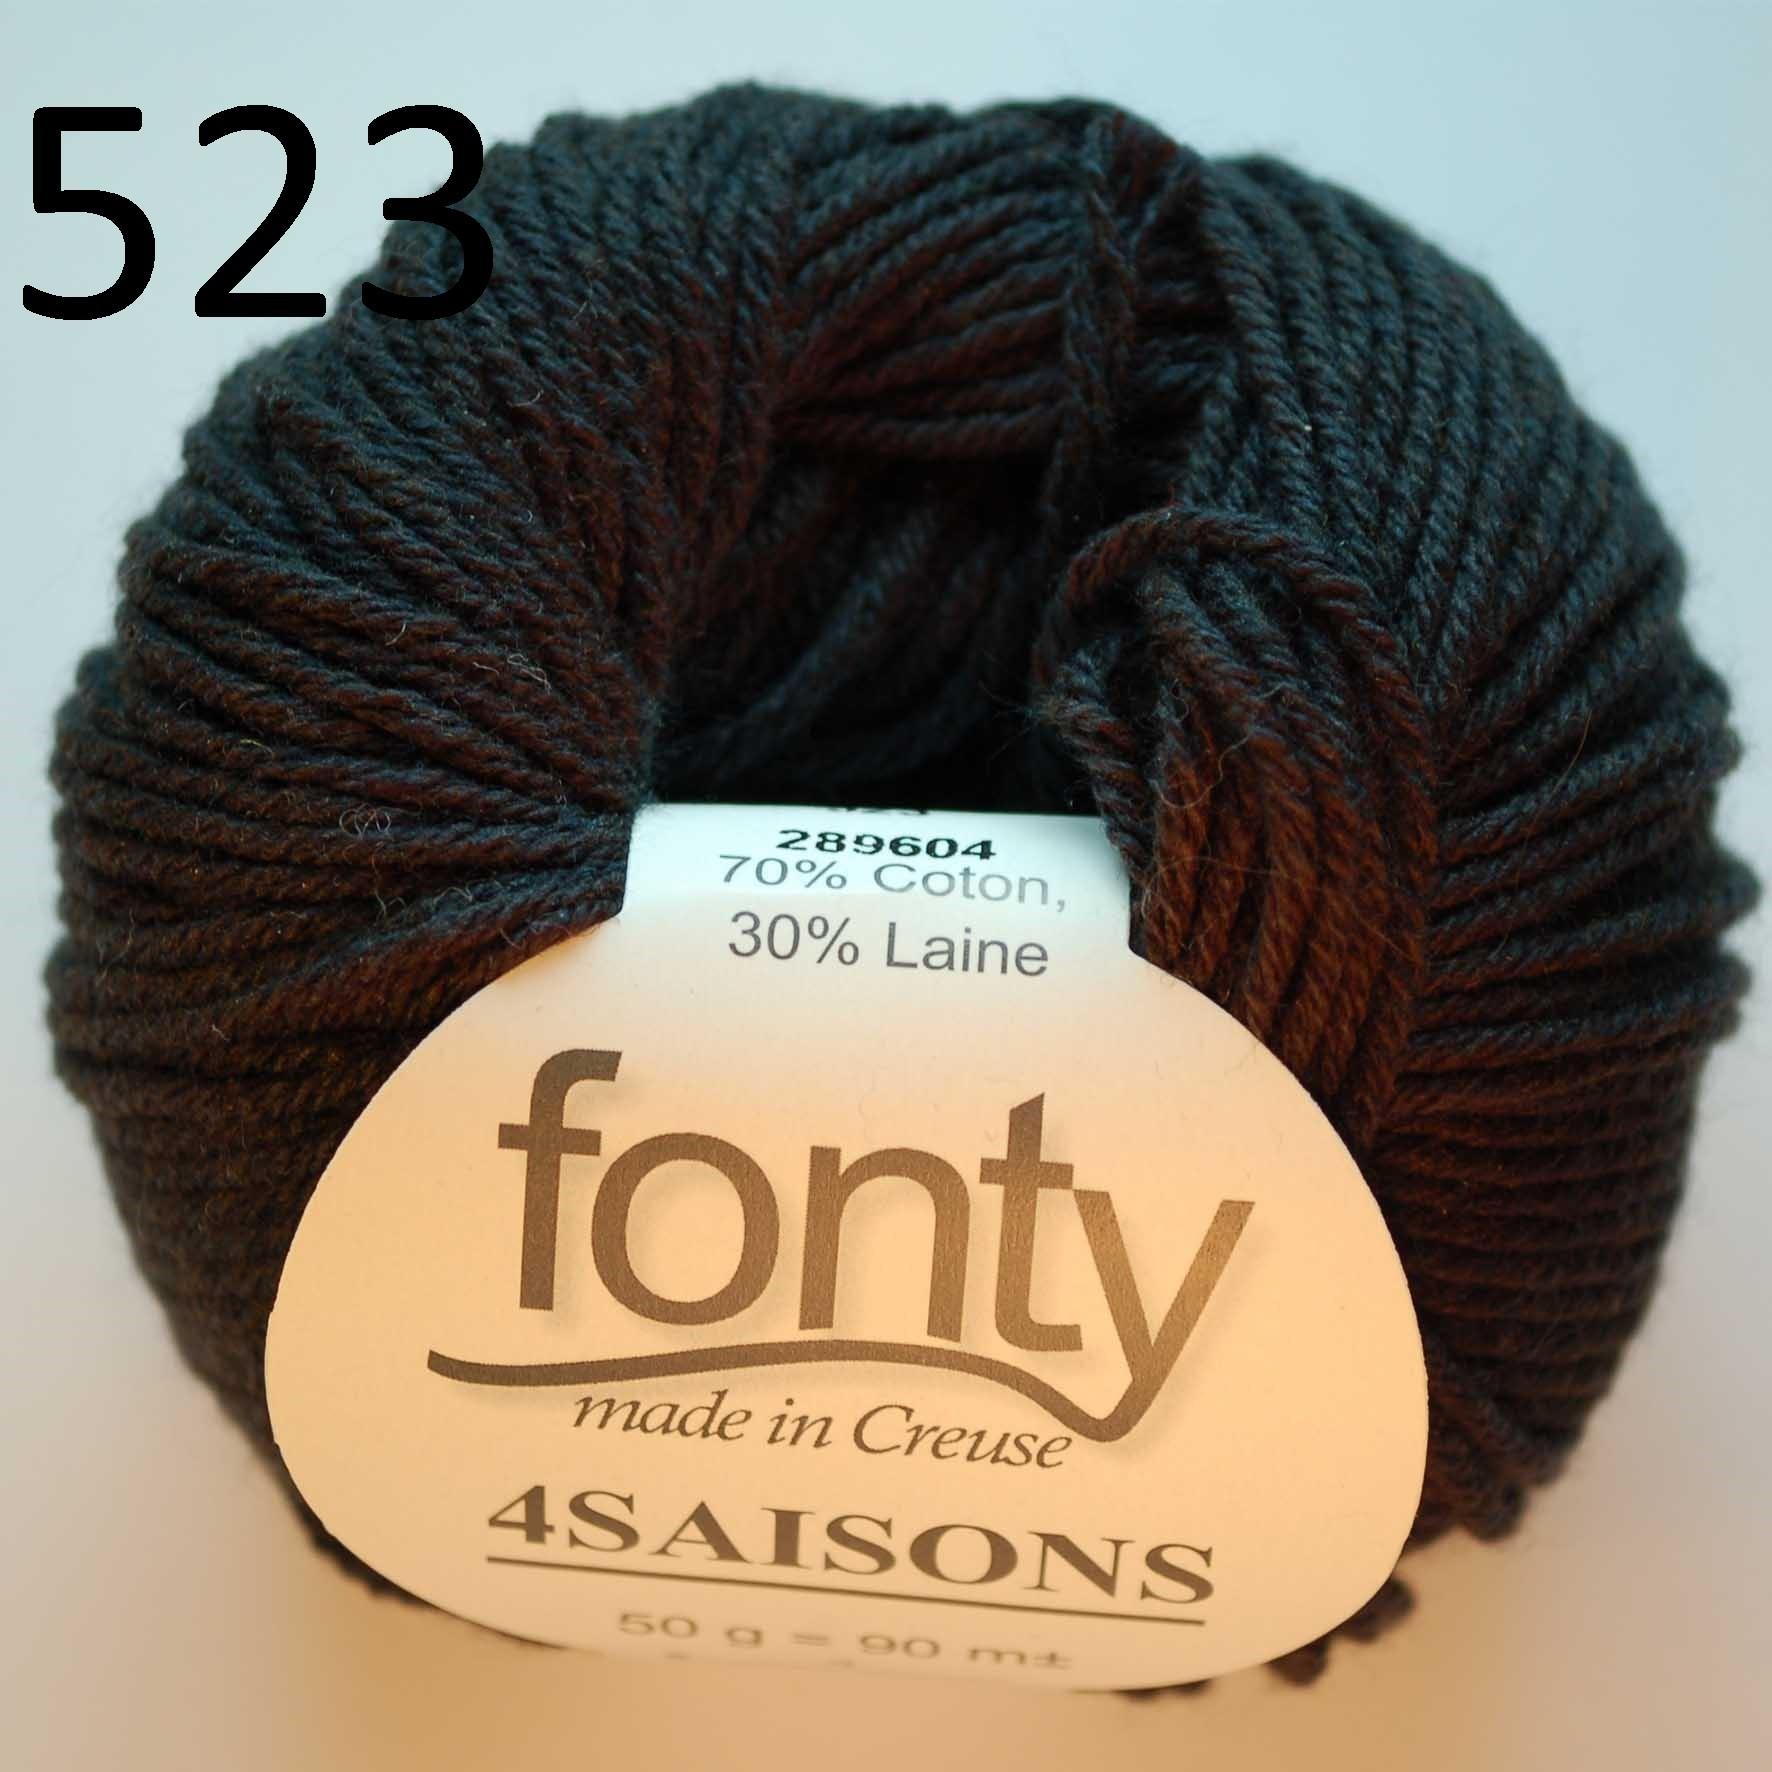 4 Saisons 523